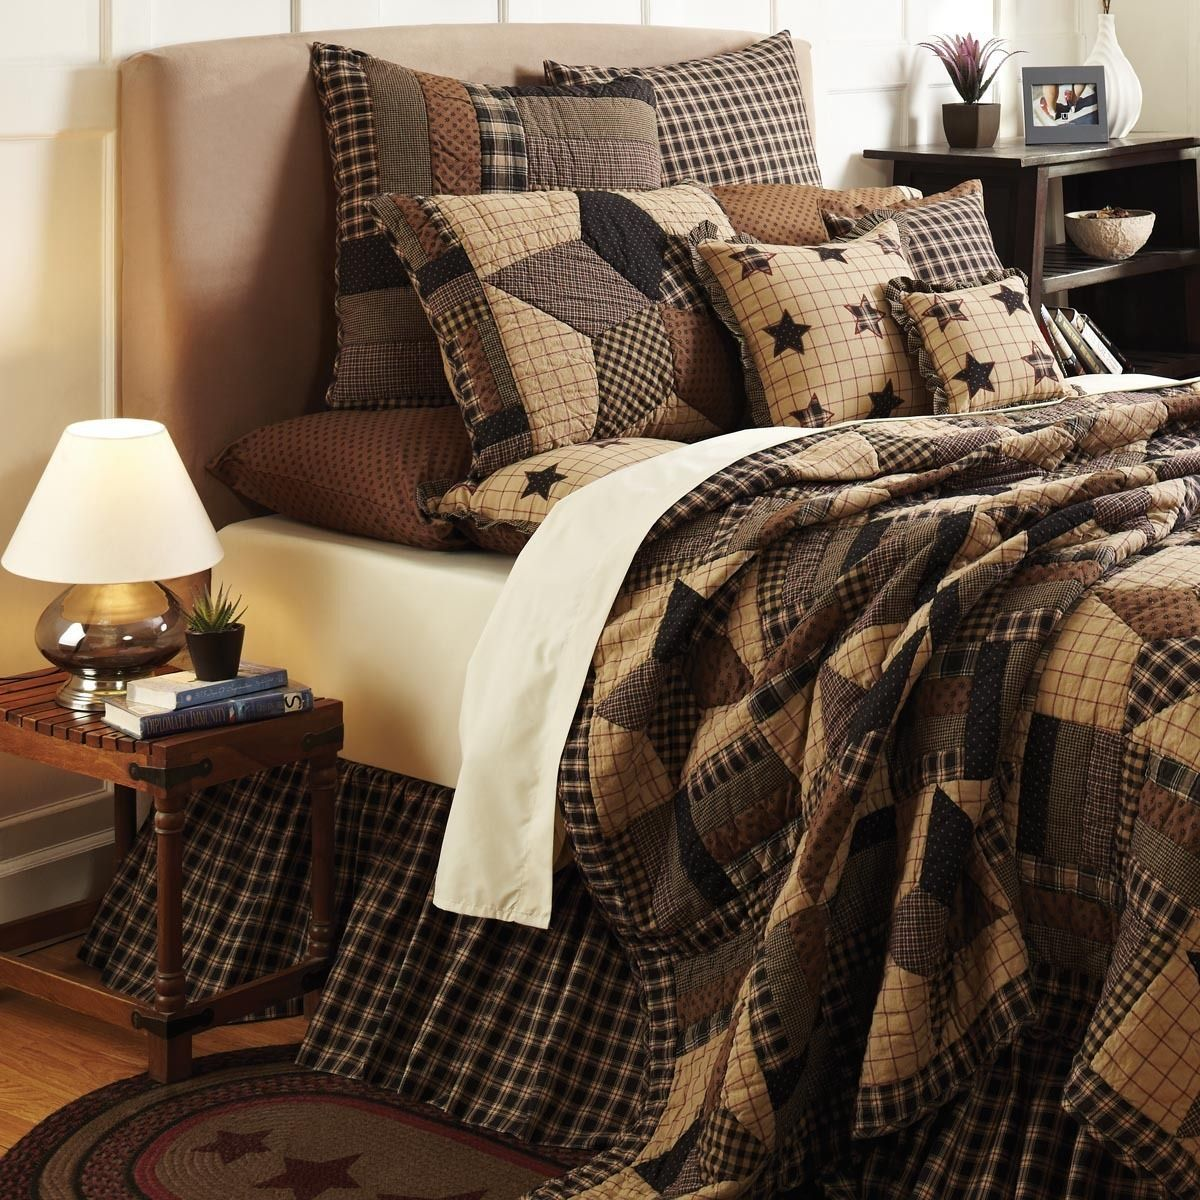 Bingham Star Quilt Black bedding, Primitive bedroom